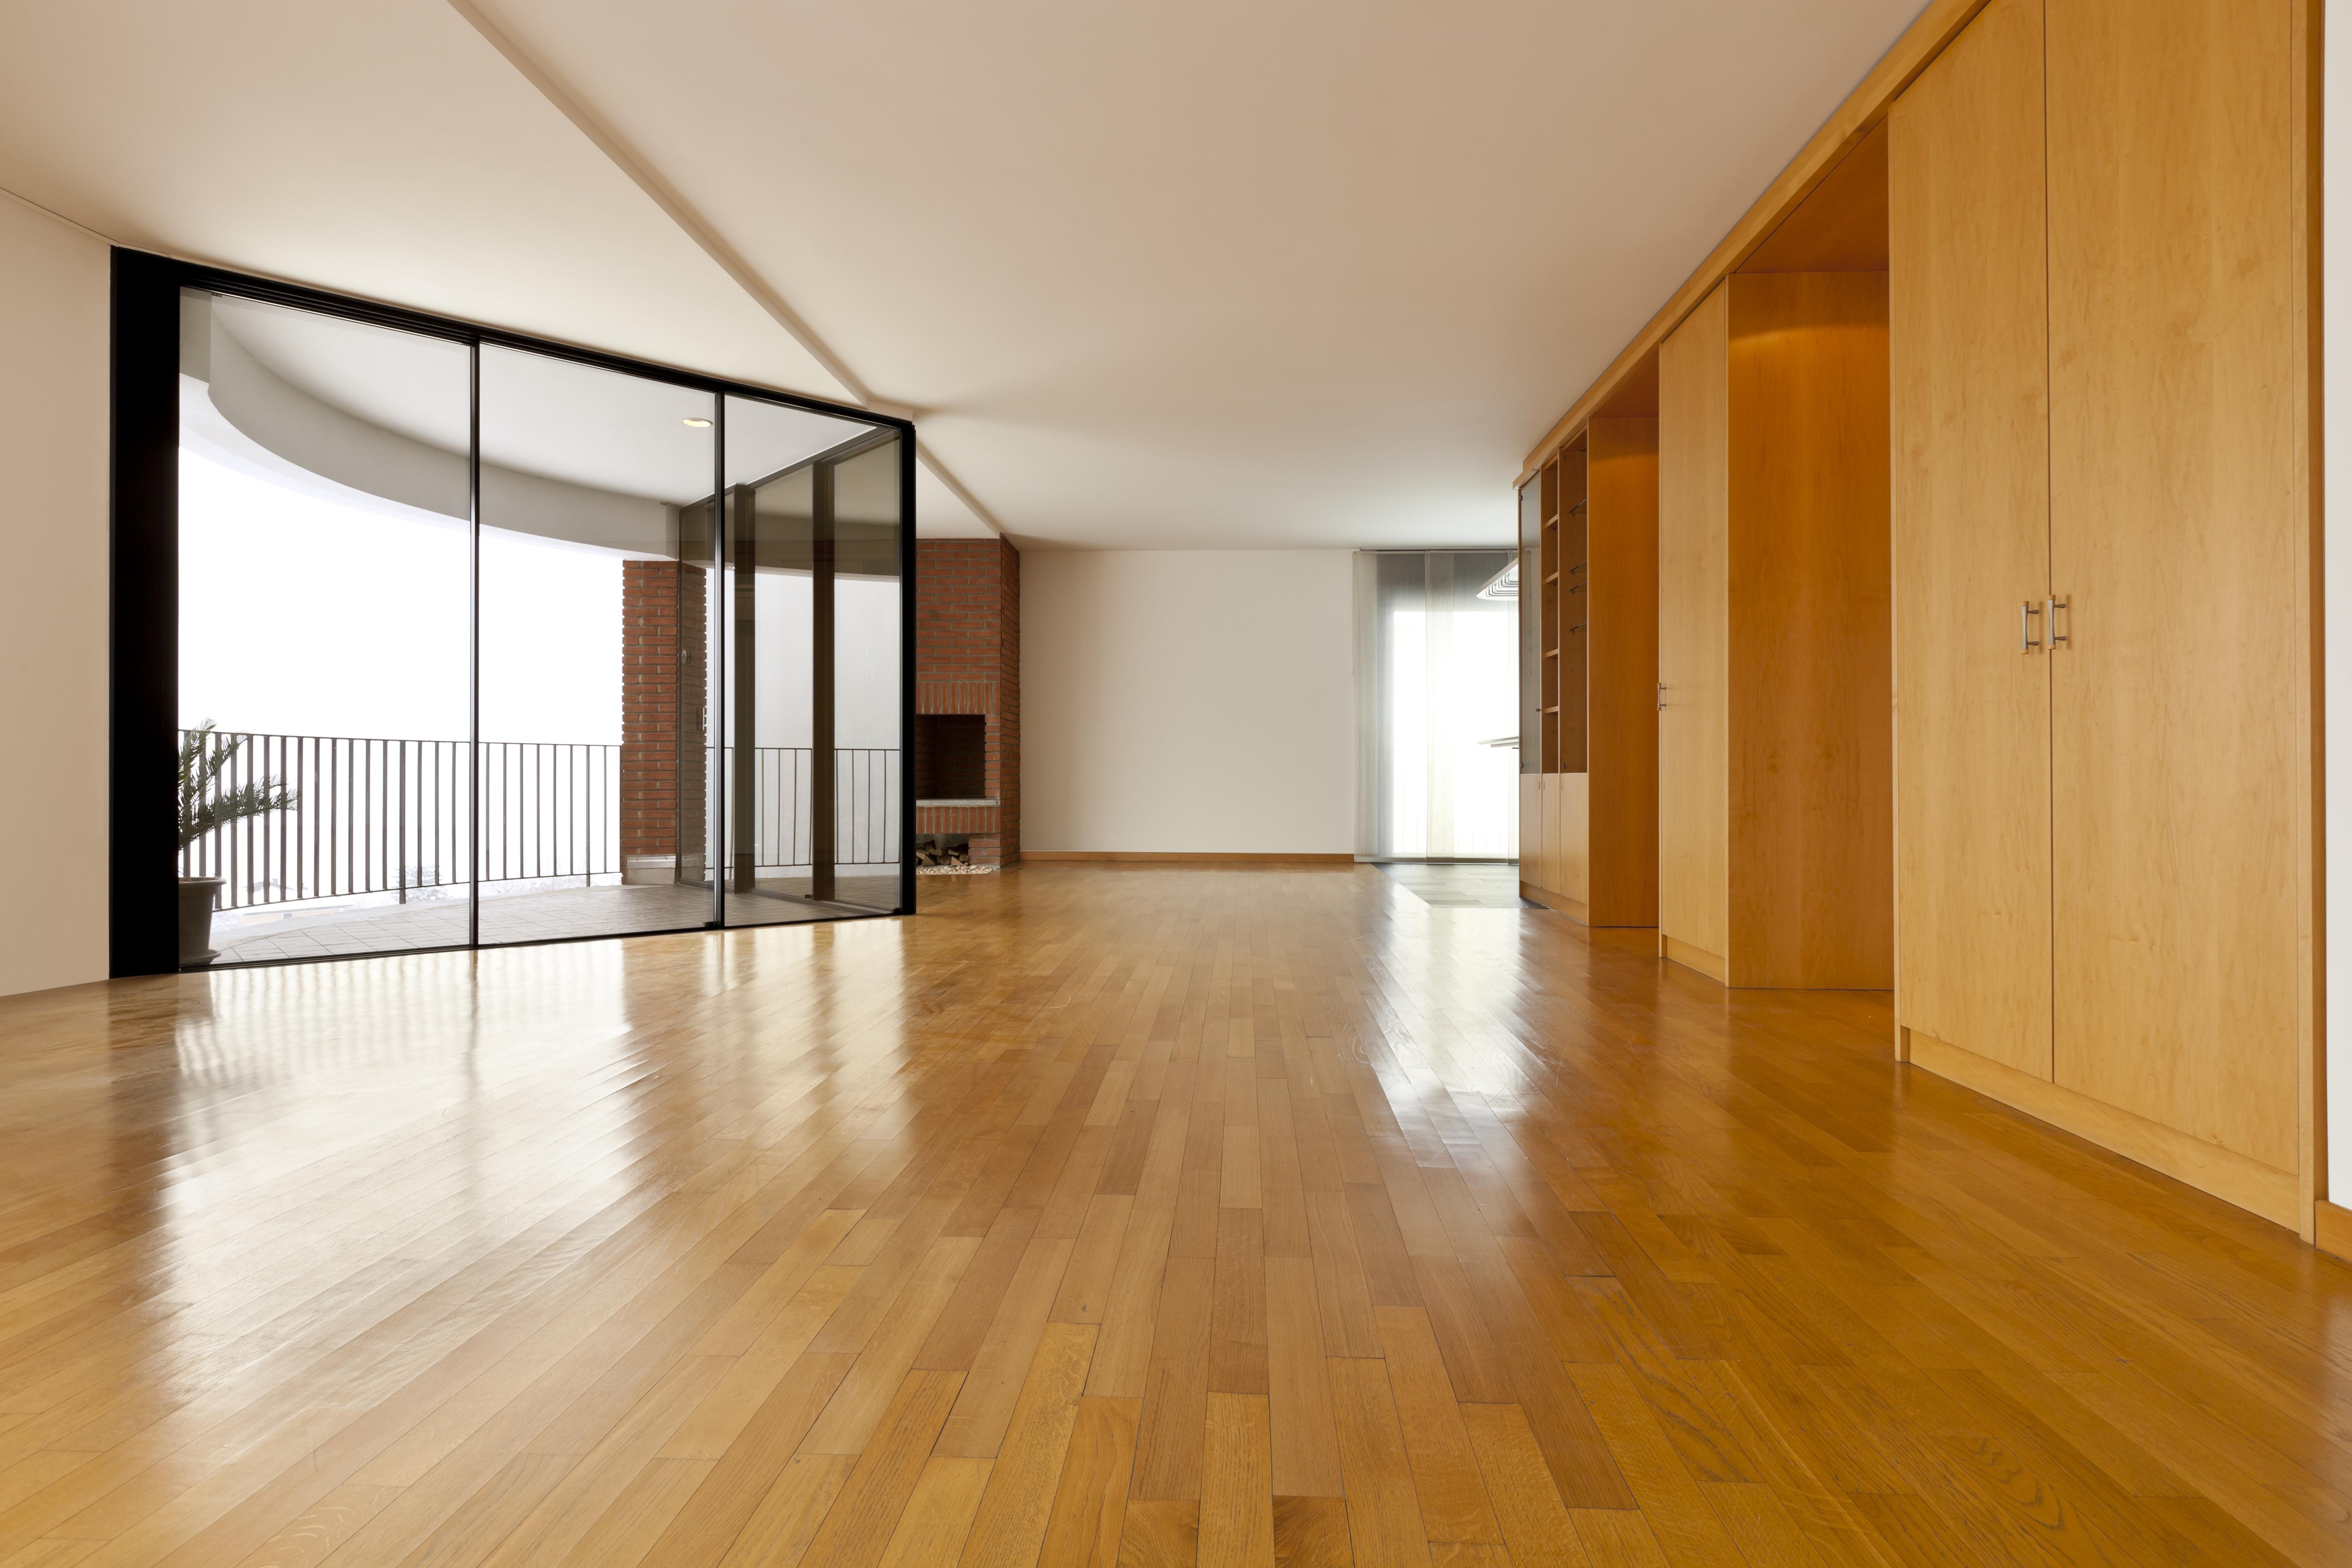 Bona Professional 128 Oz Hardwood Floor Cleaner Gallon